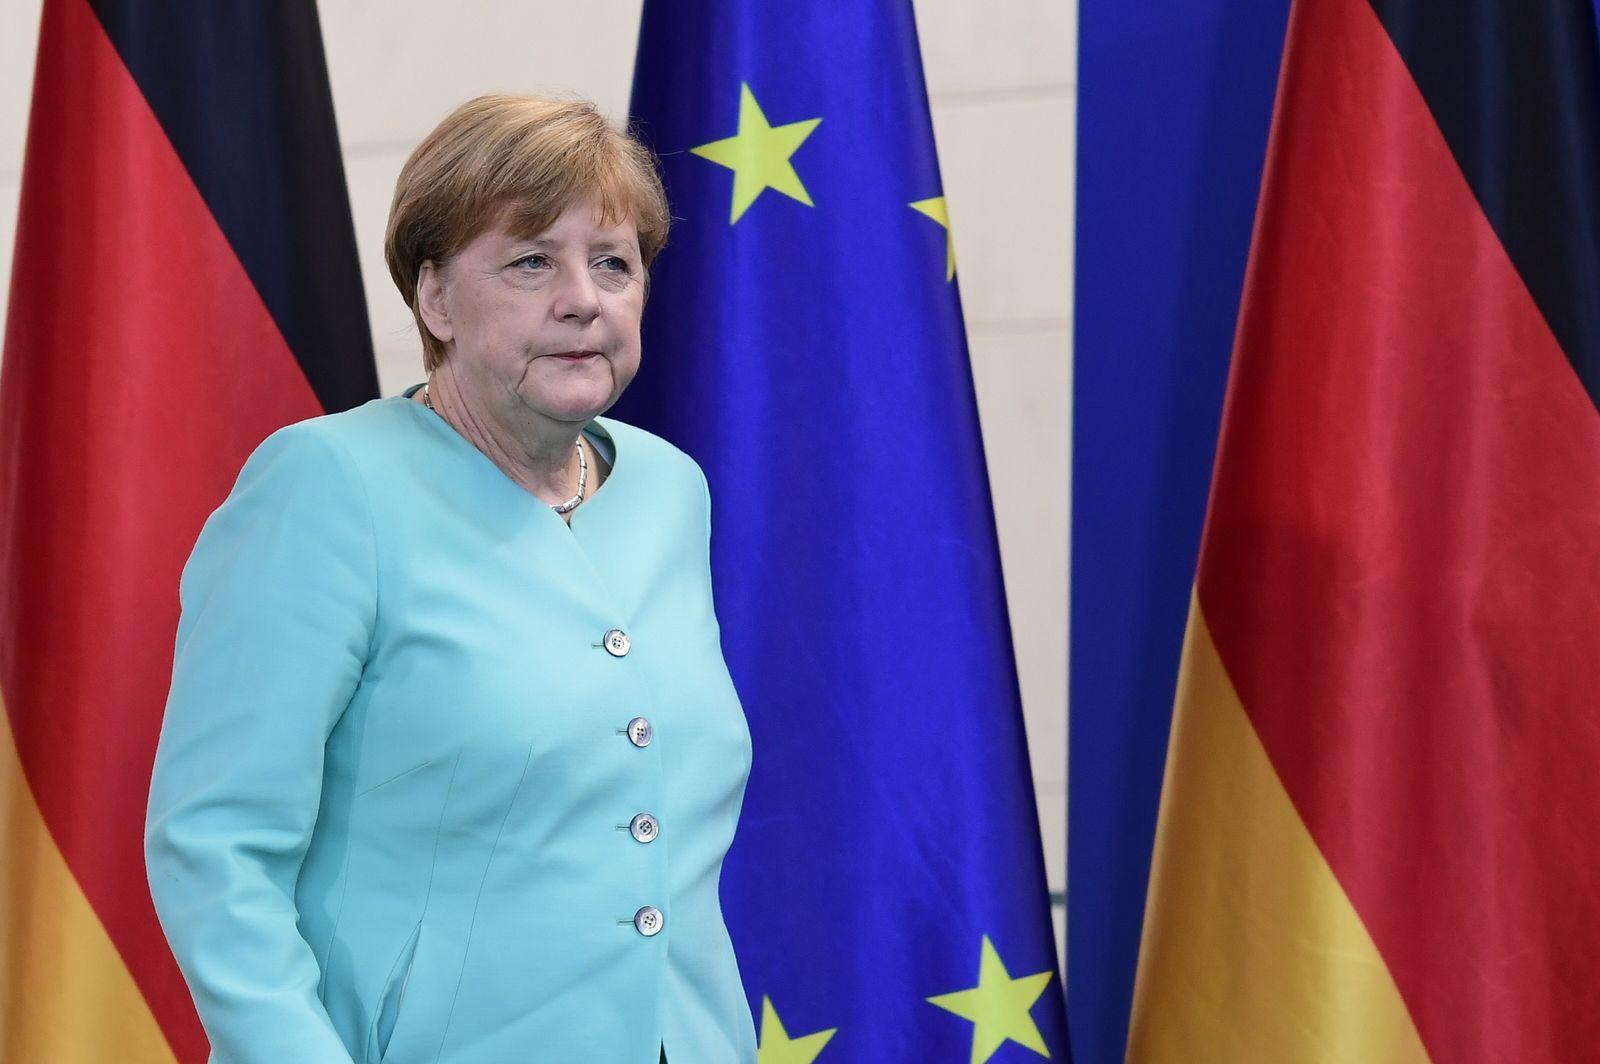 Angela Merkel / EU / Flaggen